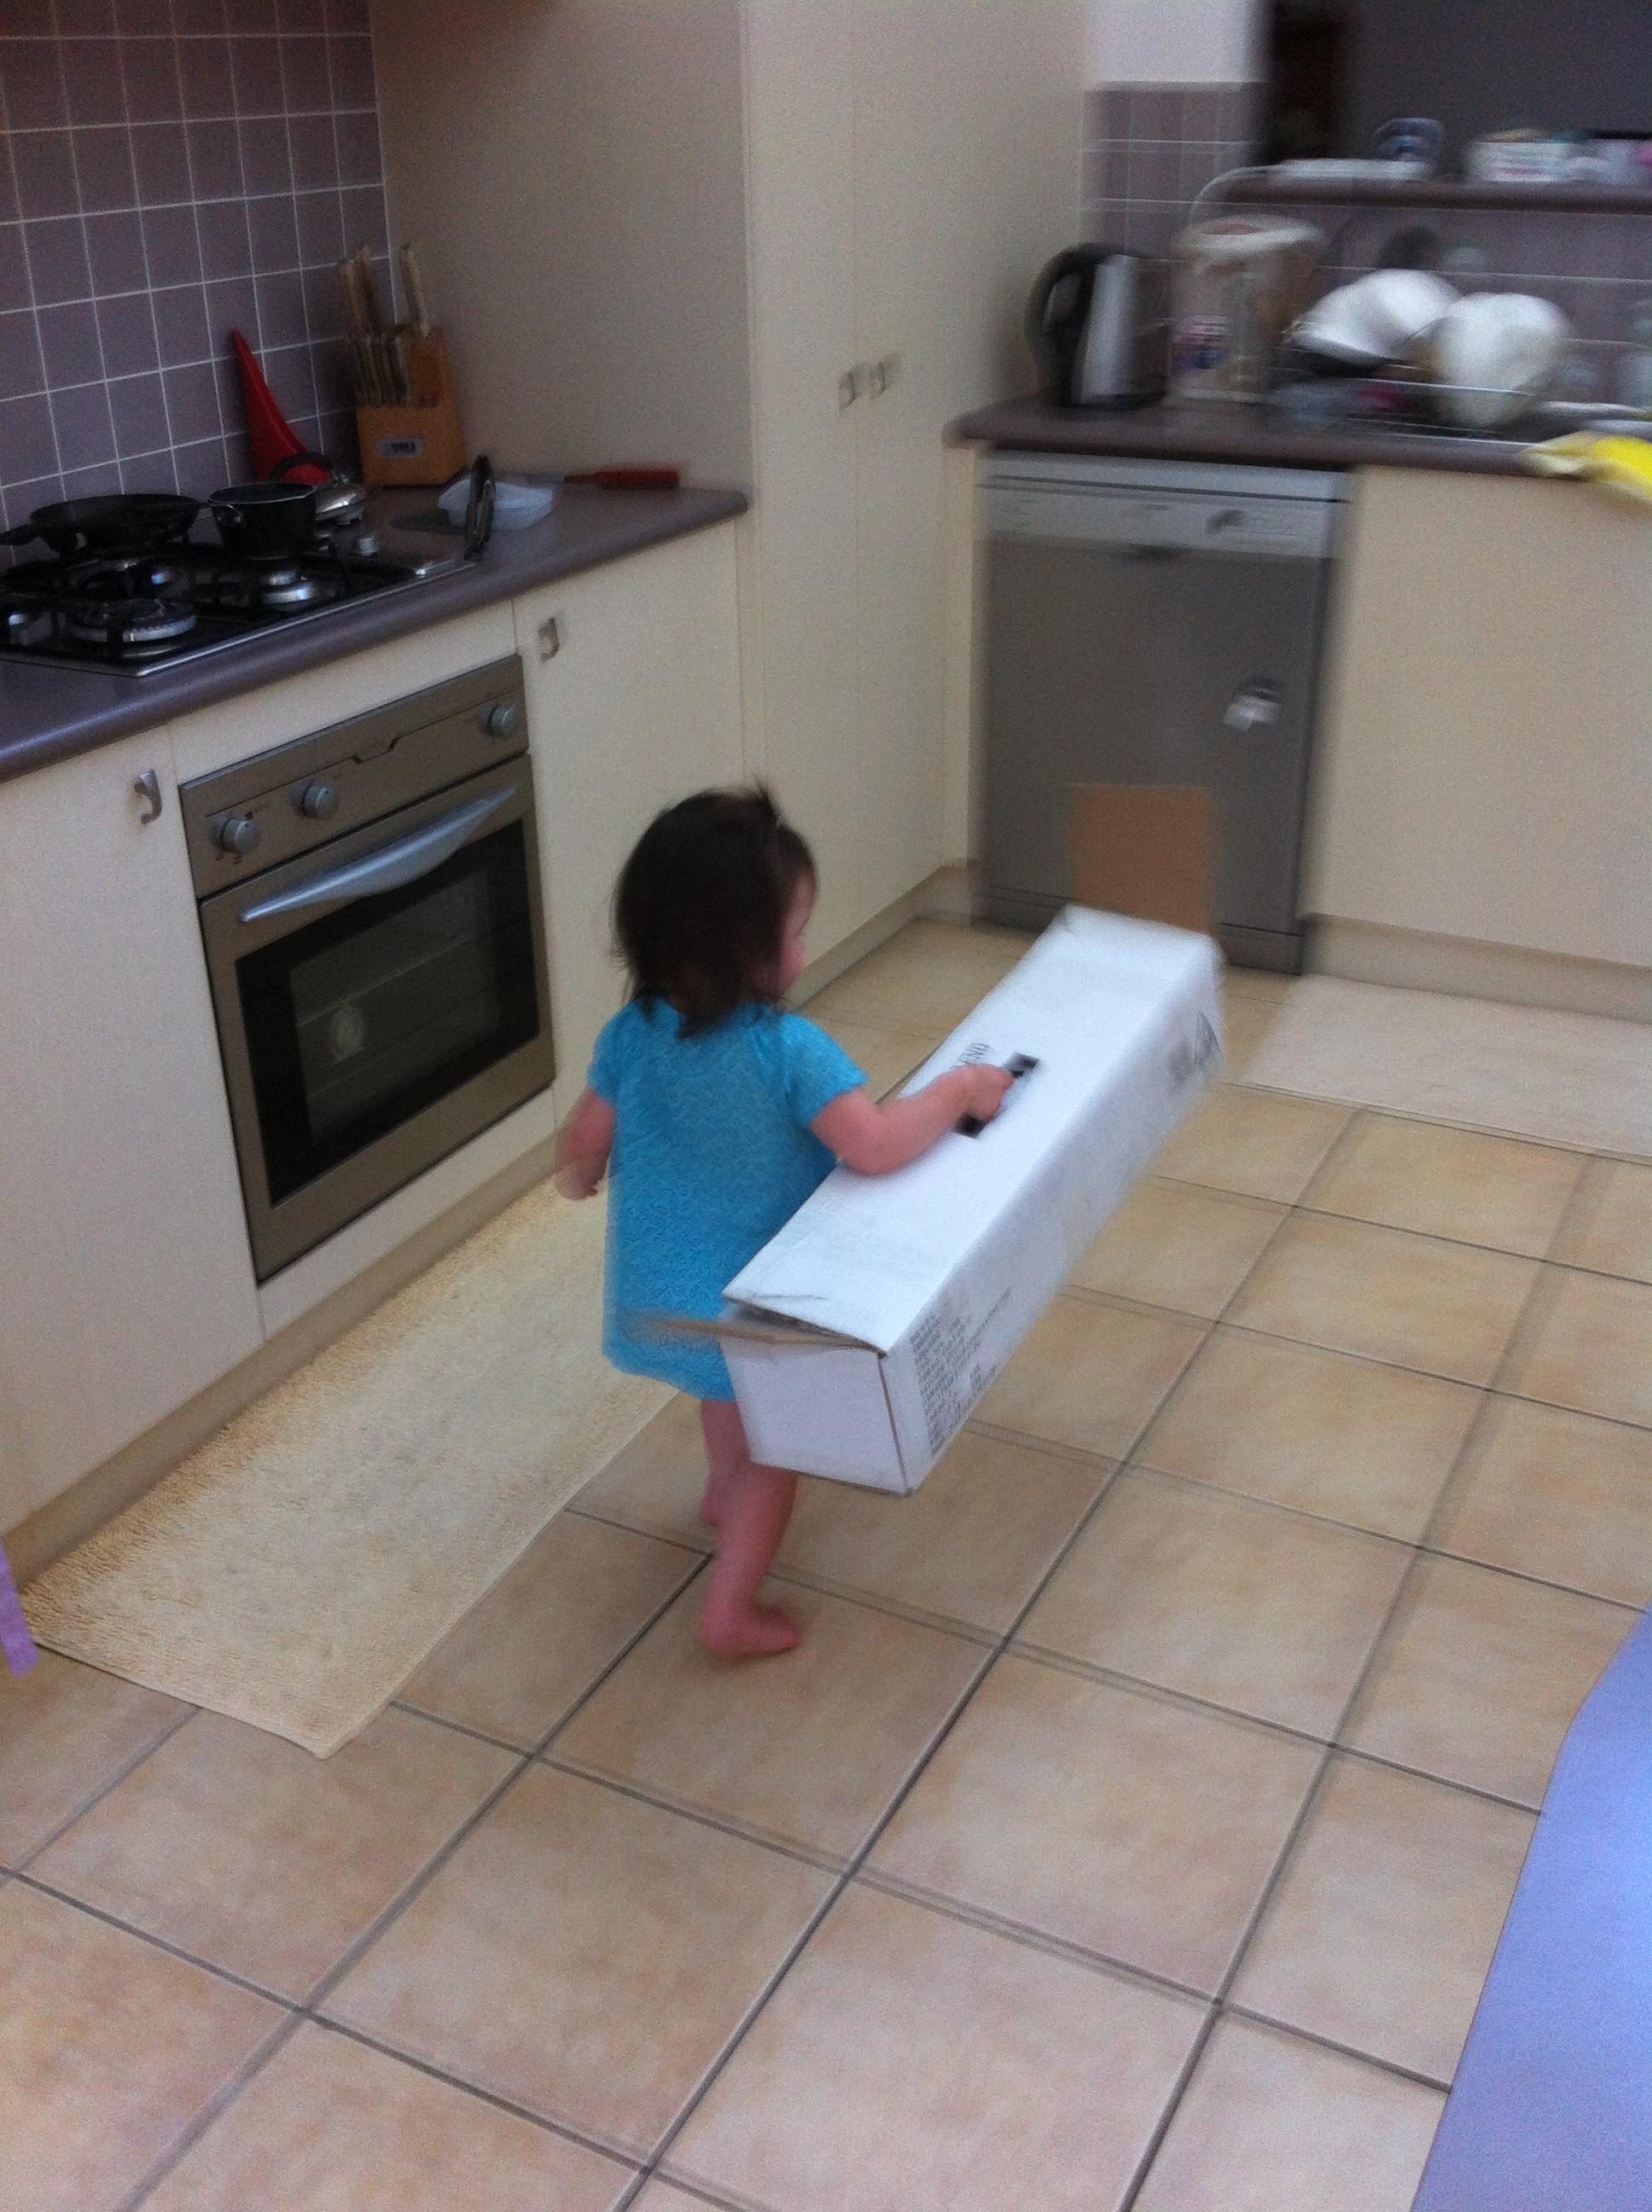 Arddun walks off with empty Christmas tree box